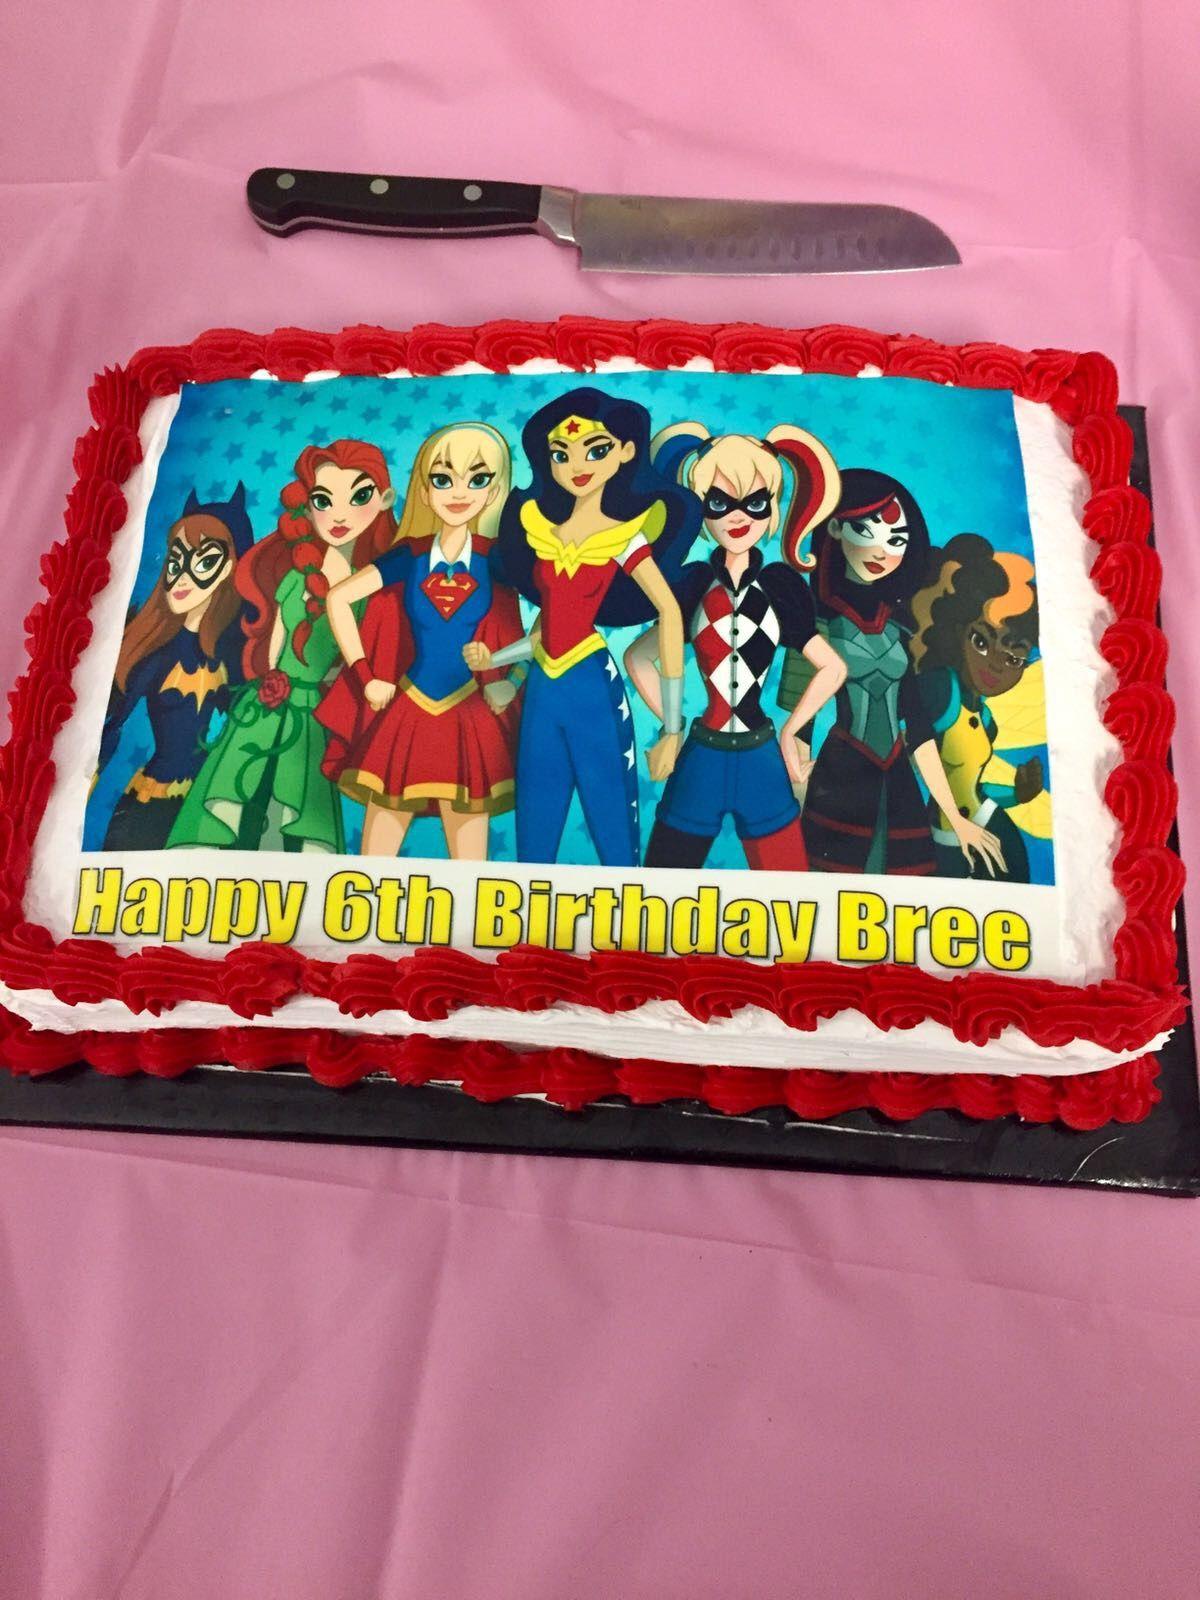 DC Superhero Girls Cake Image Printed By Edible Images